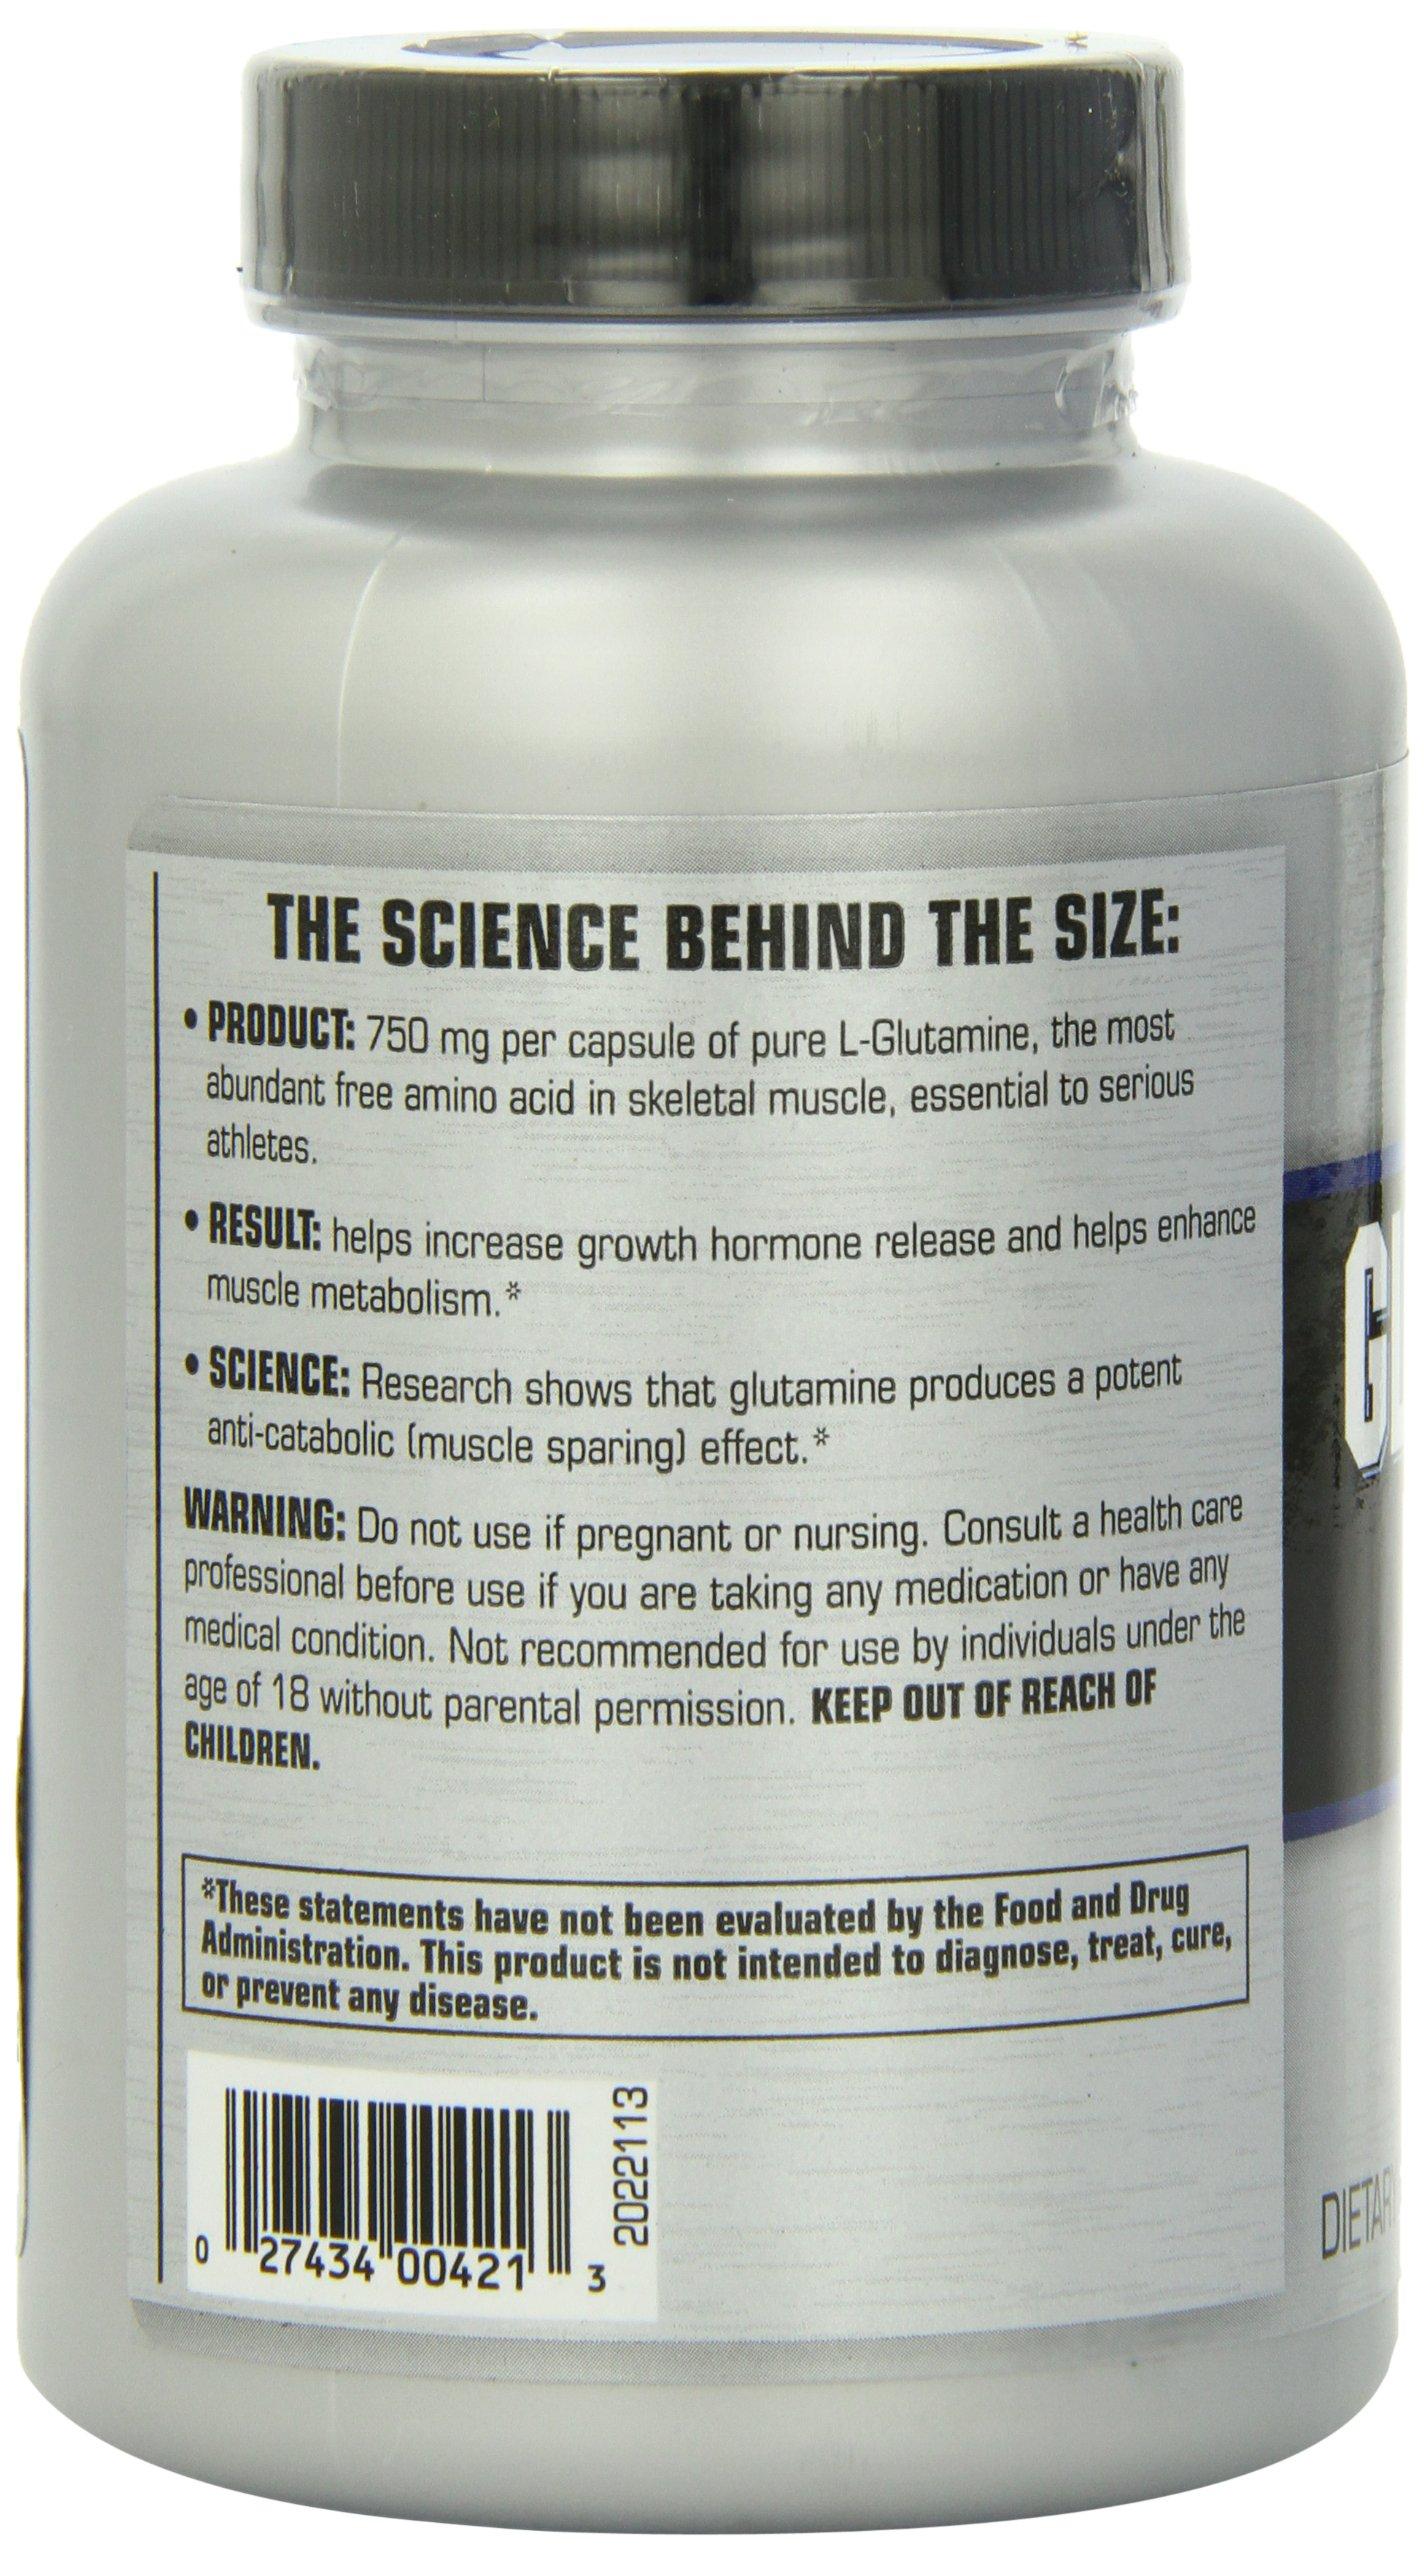 Twinlab Glutamine Fuel, 120 Capsules (Pack of 2) by Twinlab (Image #5)